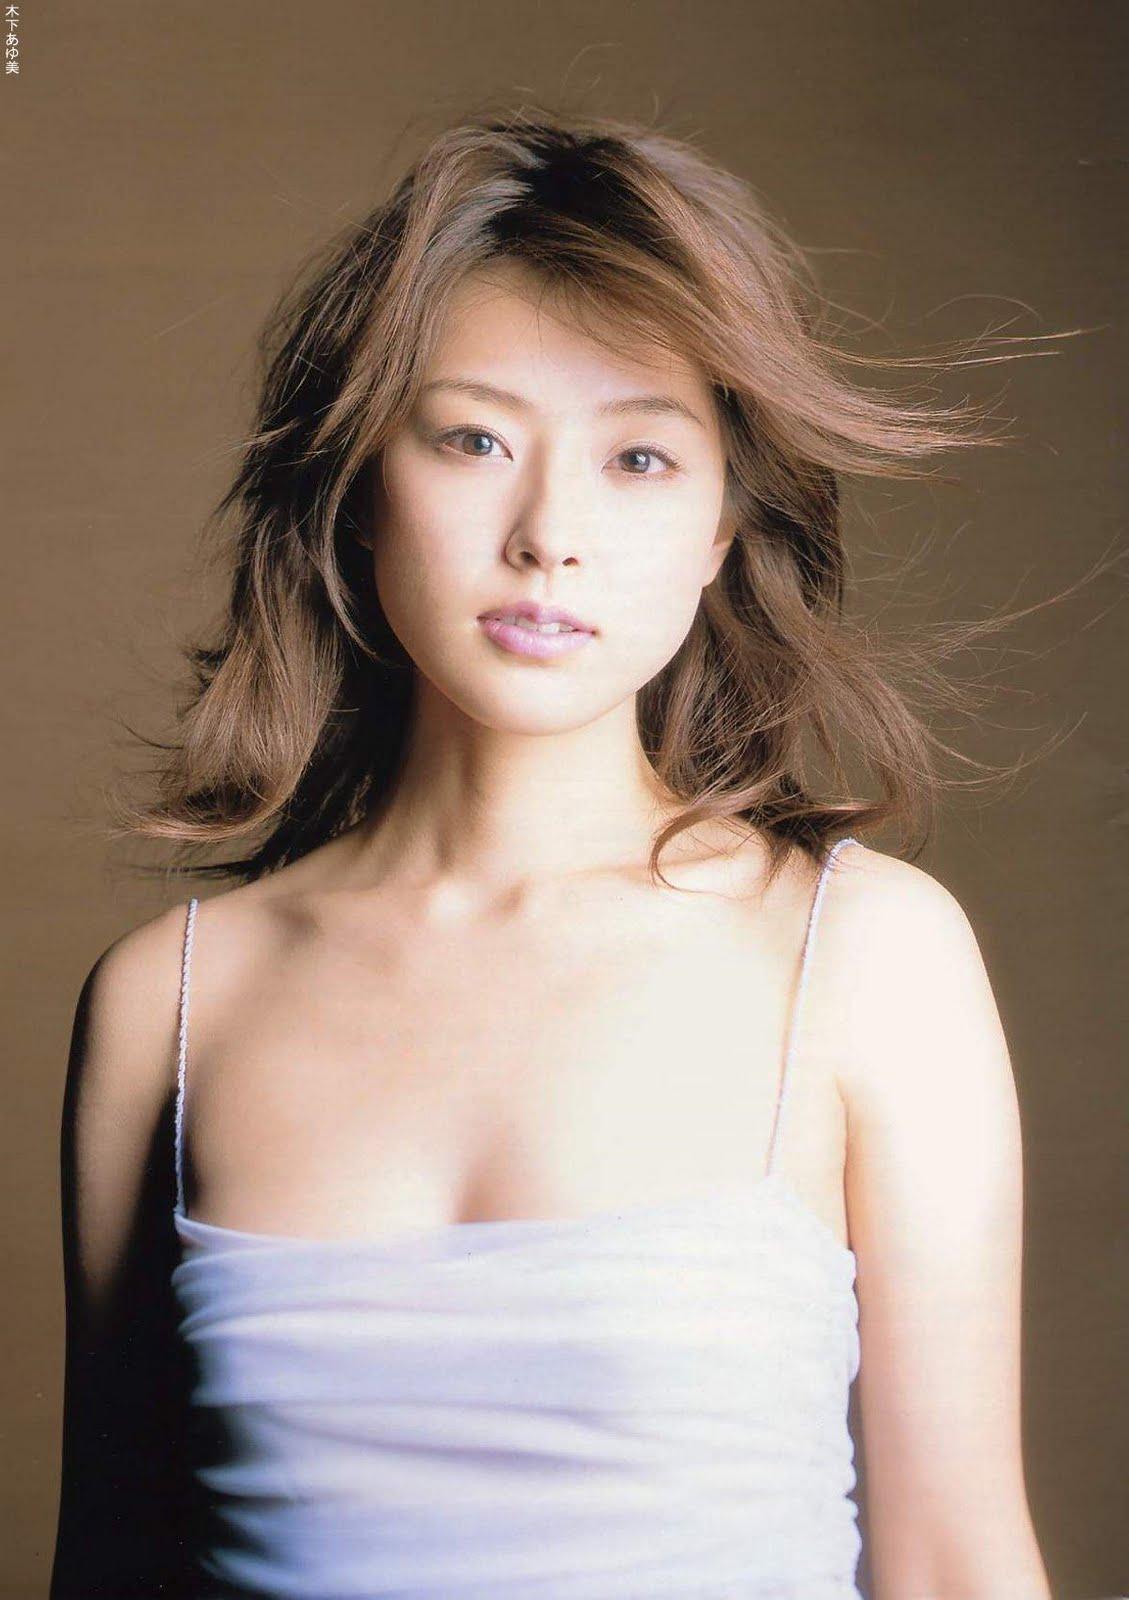 Japan Model Gallery Japanese Cute Model Ayumi Kinoshita 3-8430